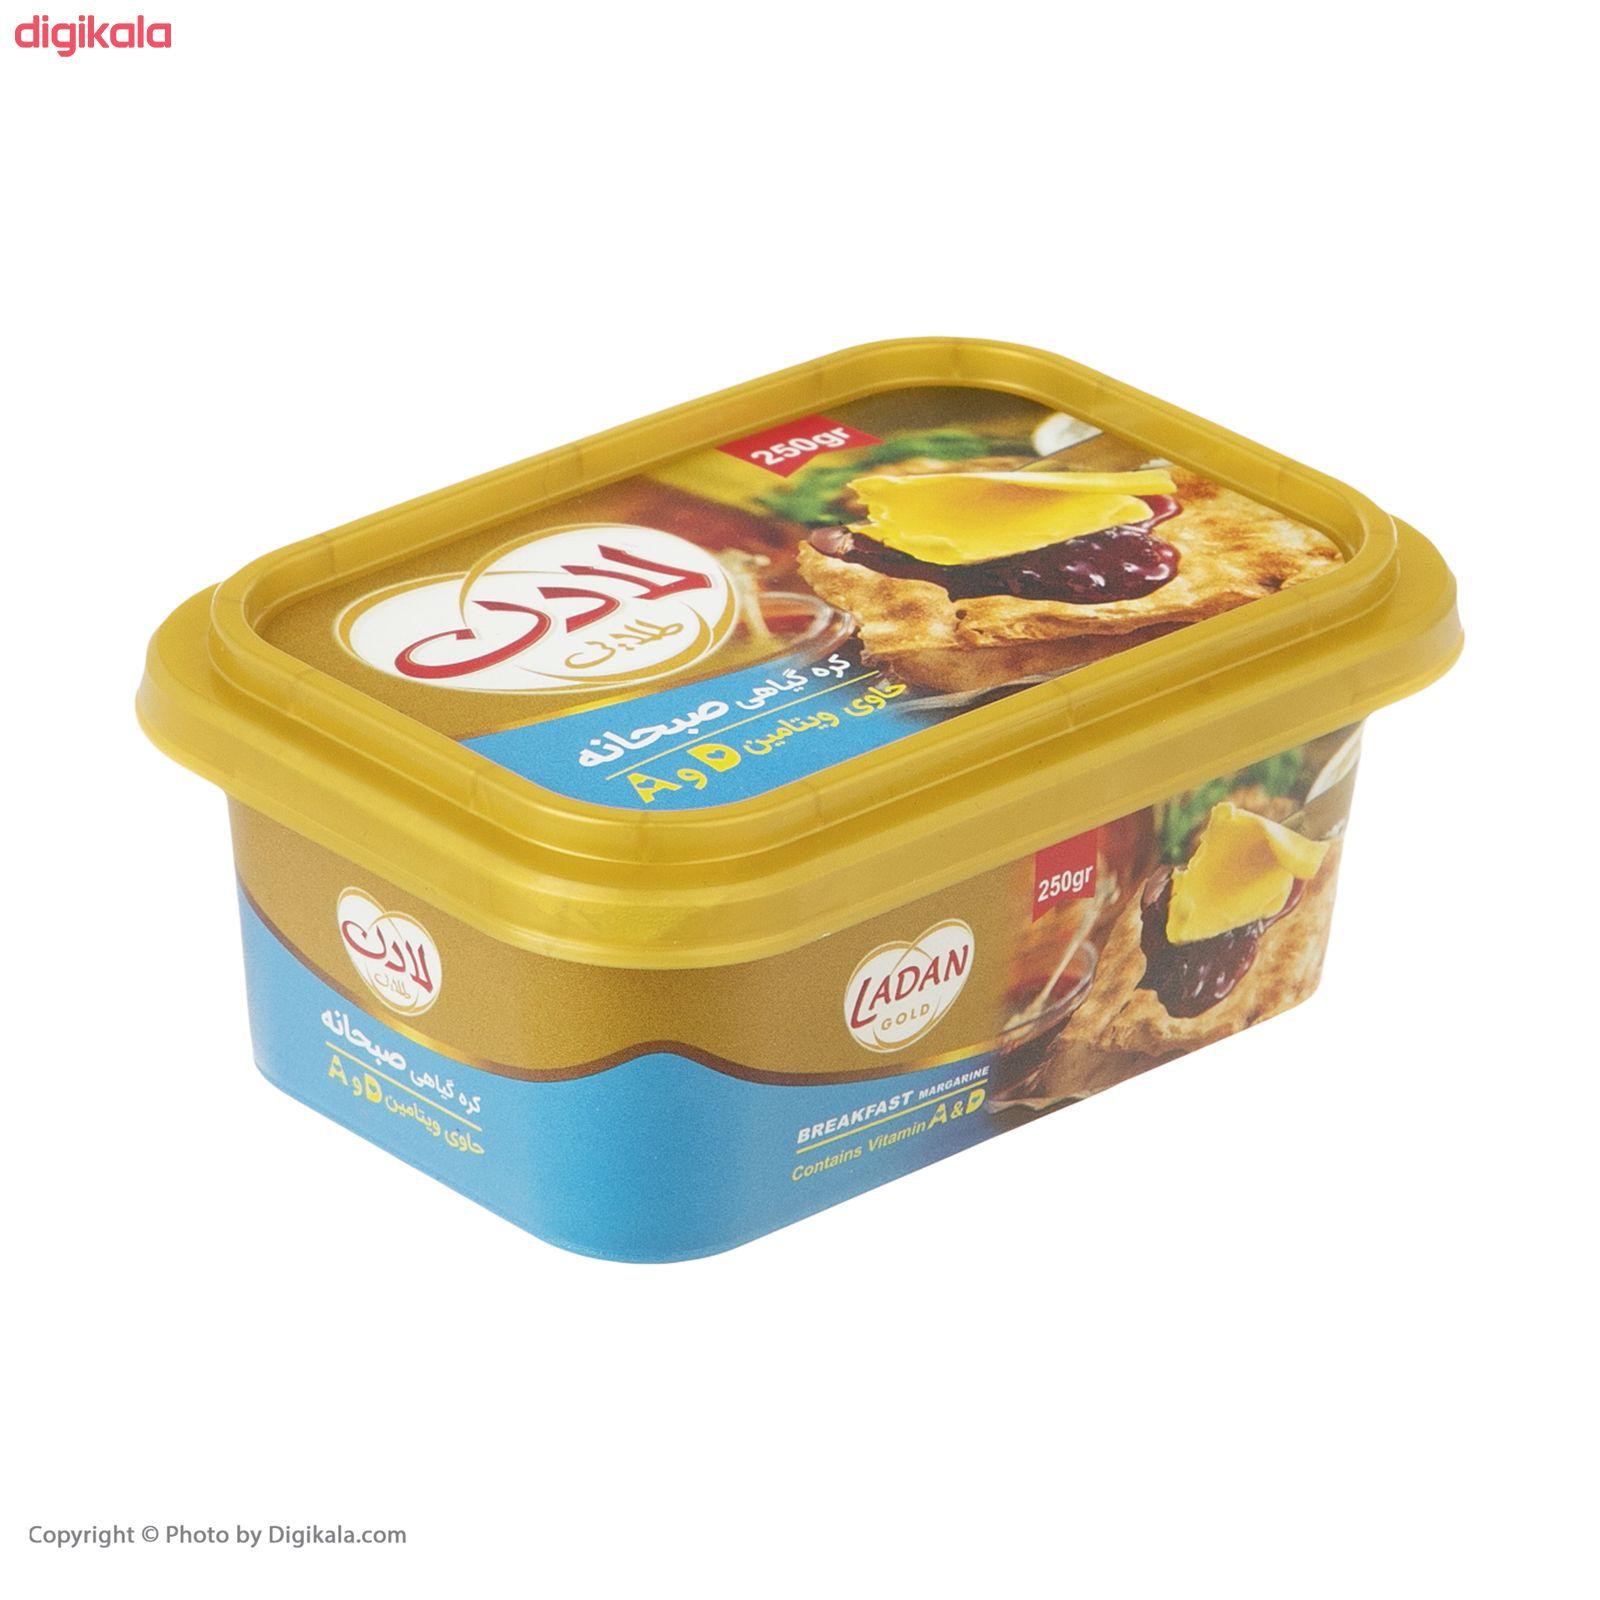 کره گیاهی صبحانه لادن - 250 گرم  main 1 4